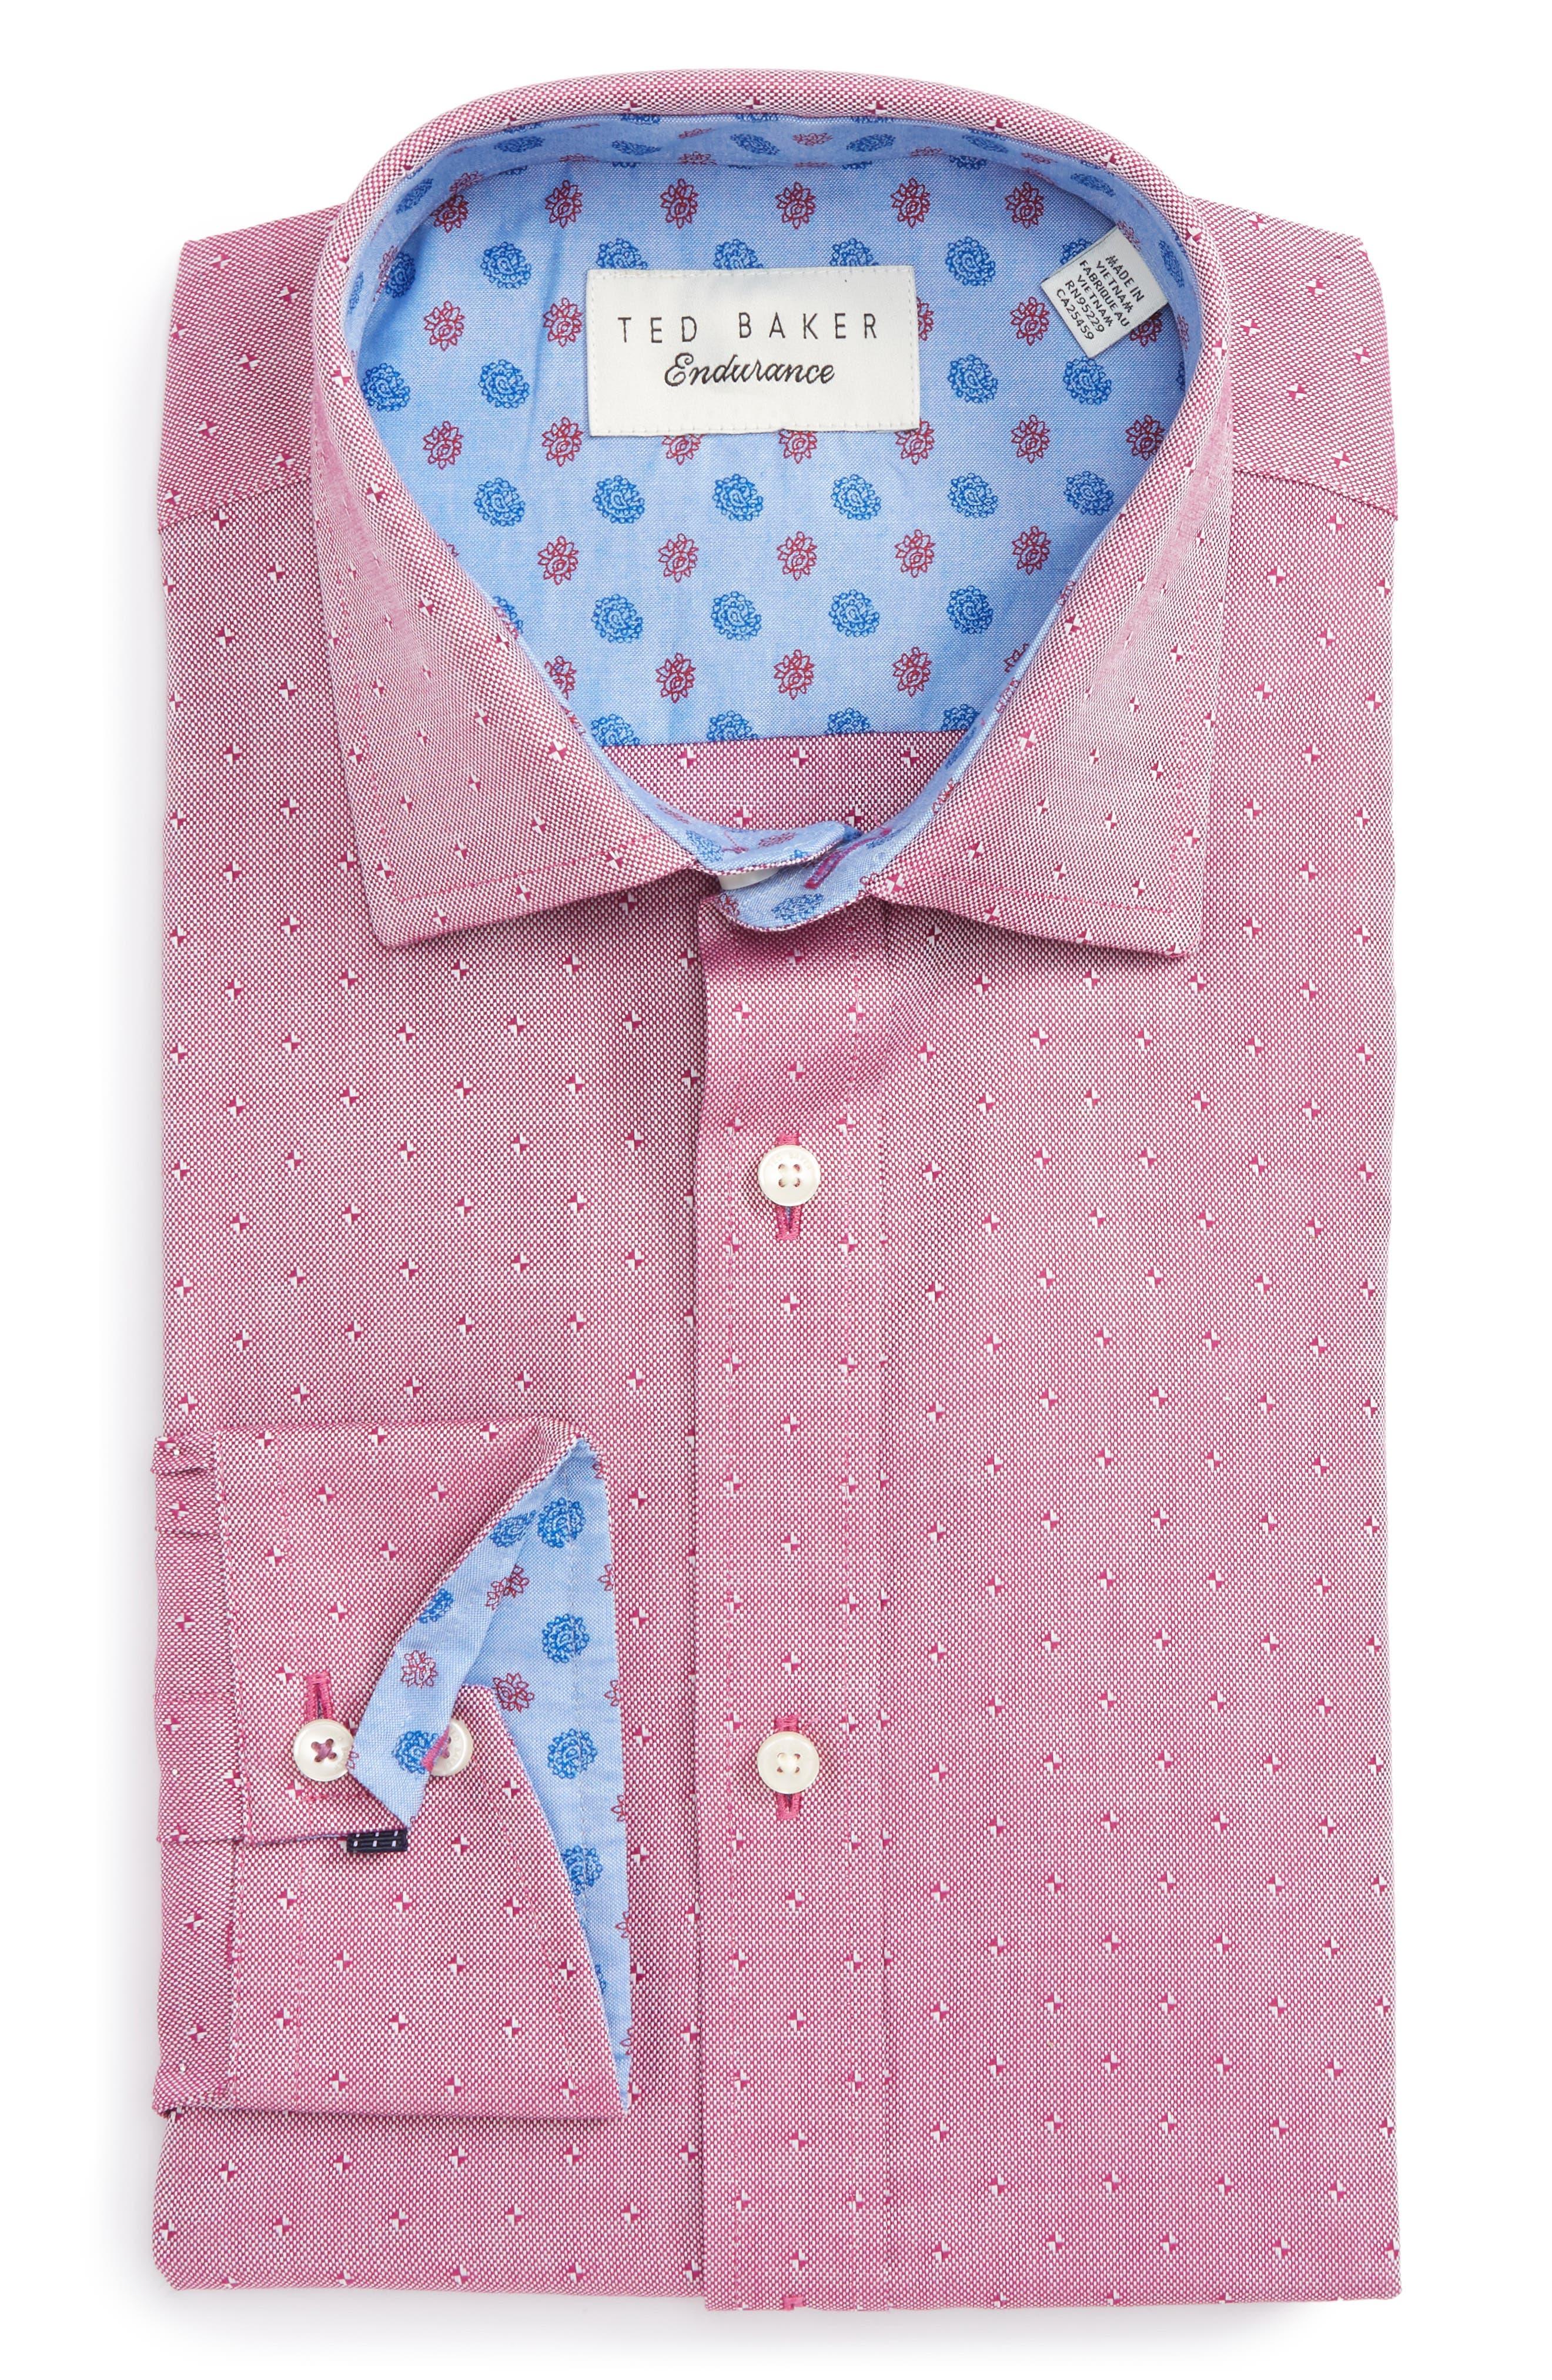 Jamer Trim Fit Dot Dress Shirt,                             Main thumbnail 1, color,                             611